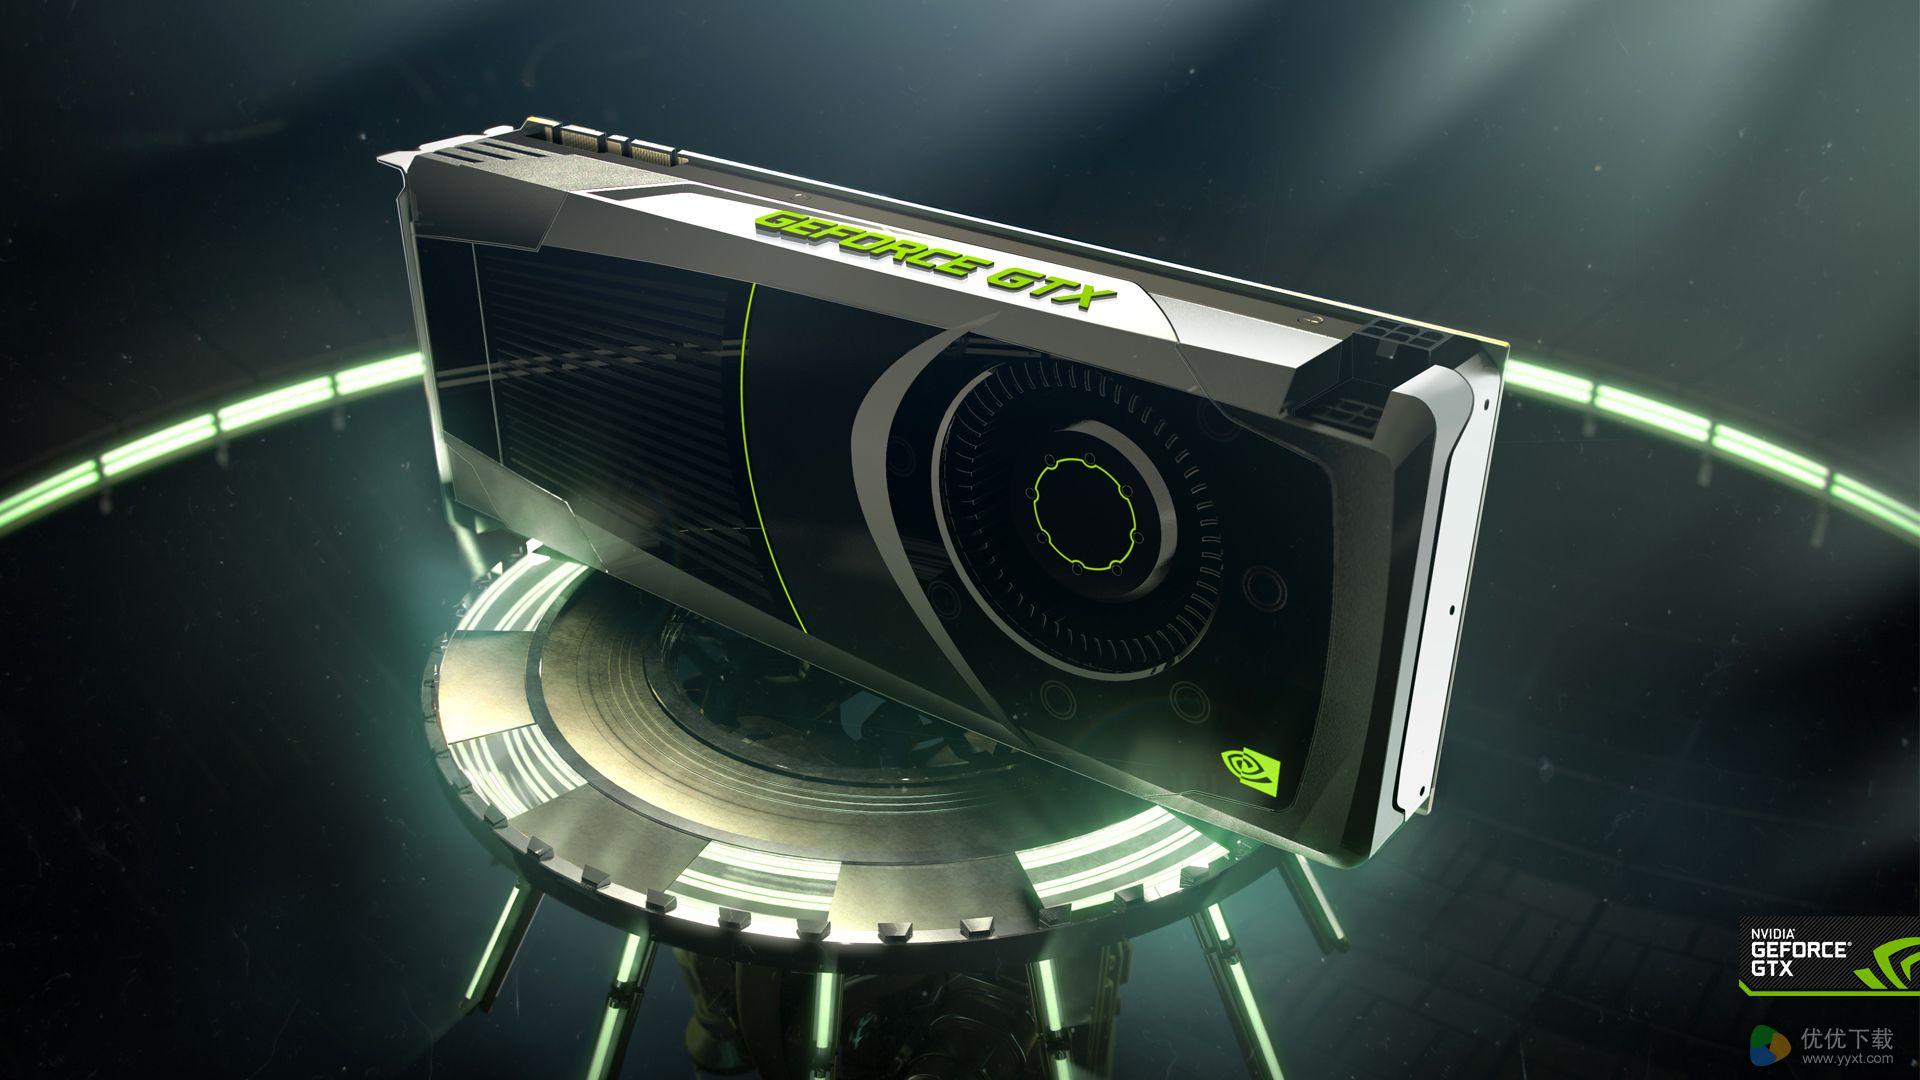 Nvidia显卡驱动桌面版 v372.90 - 截图1